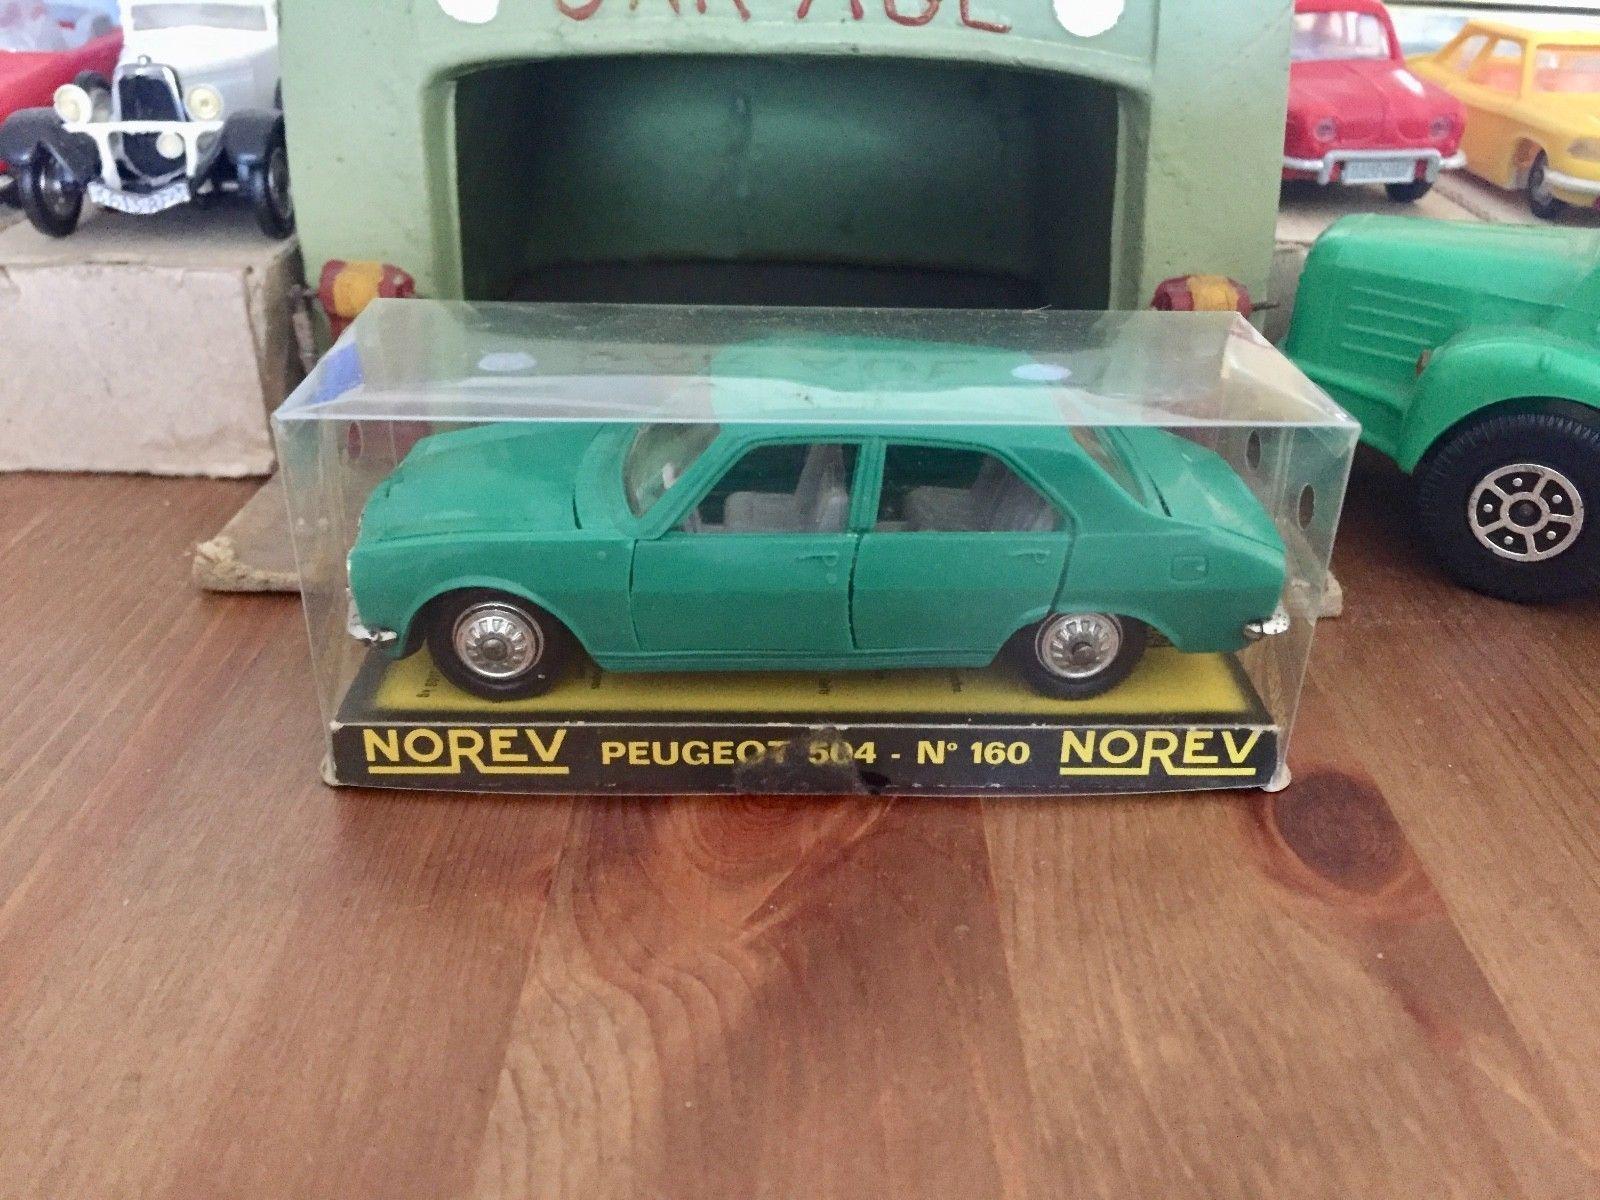 N°160 Plastique 143 Norev Peugeot Ech Ancienne EmeEbay 504 exBdCWro